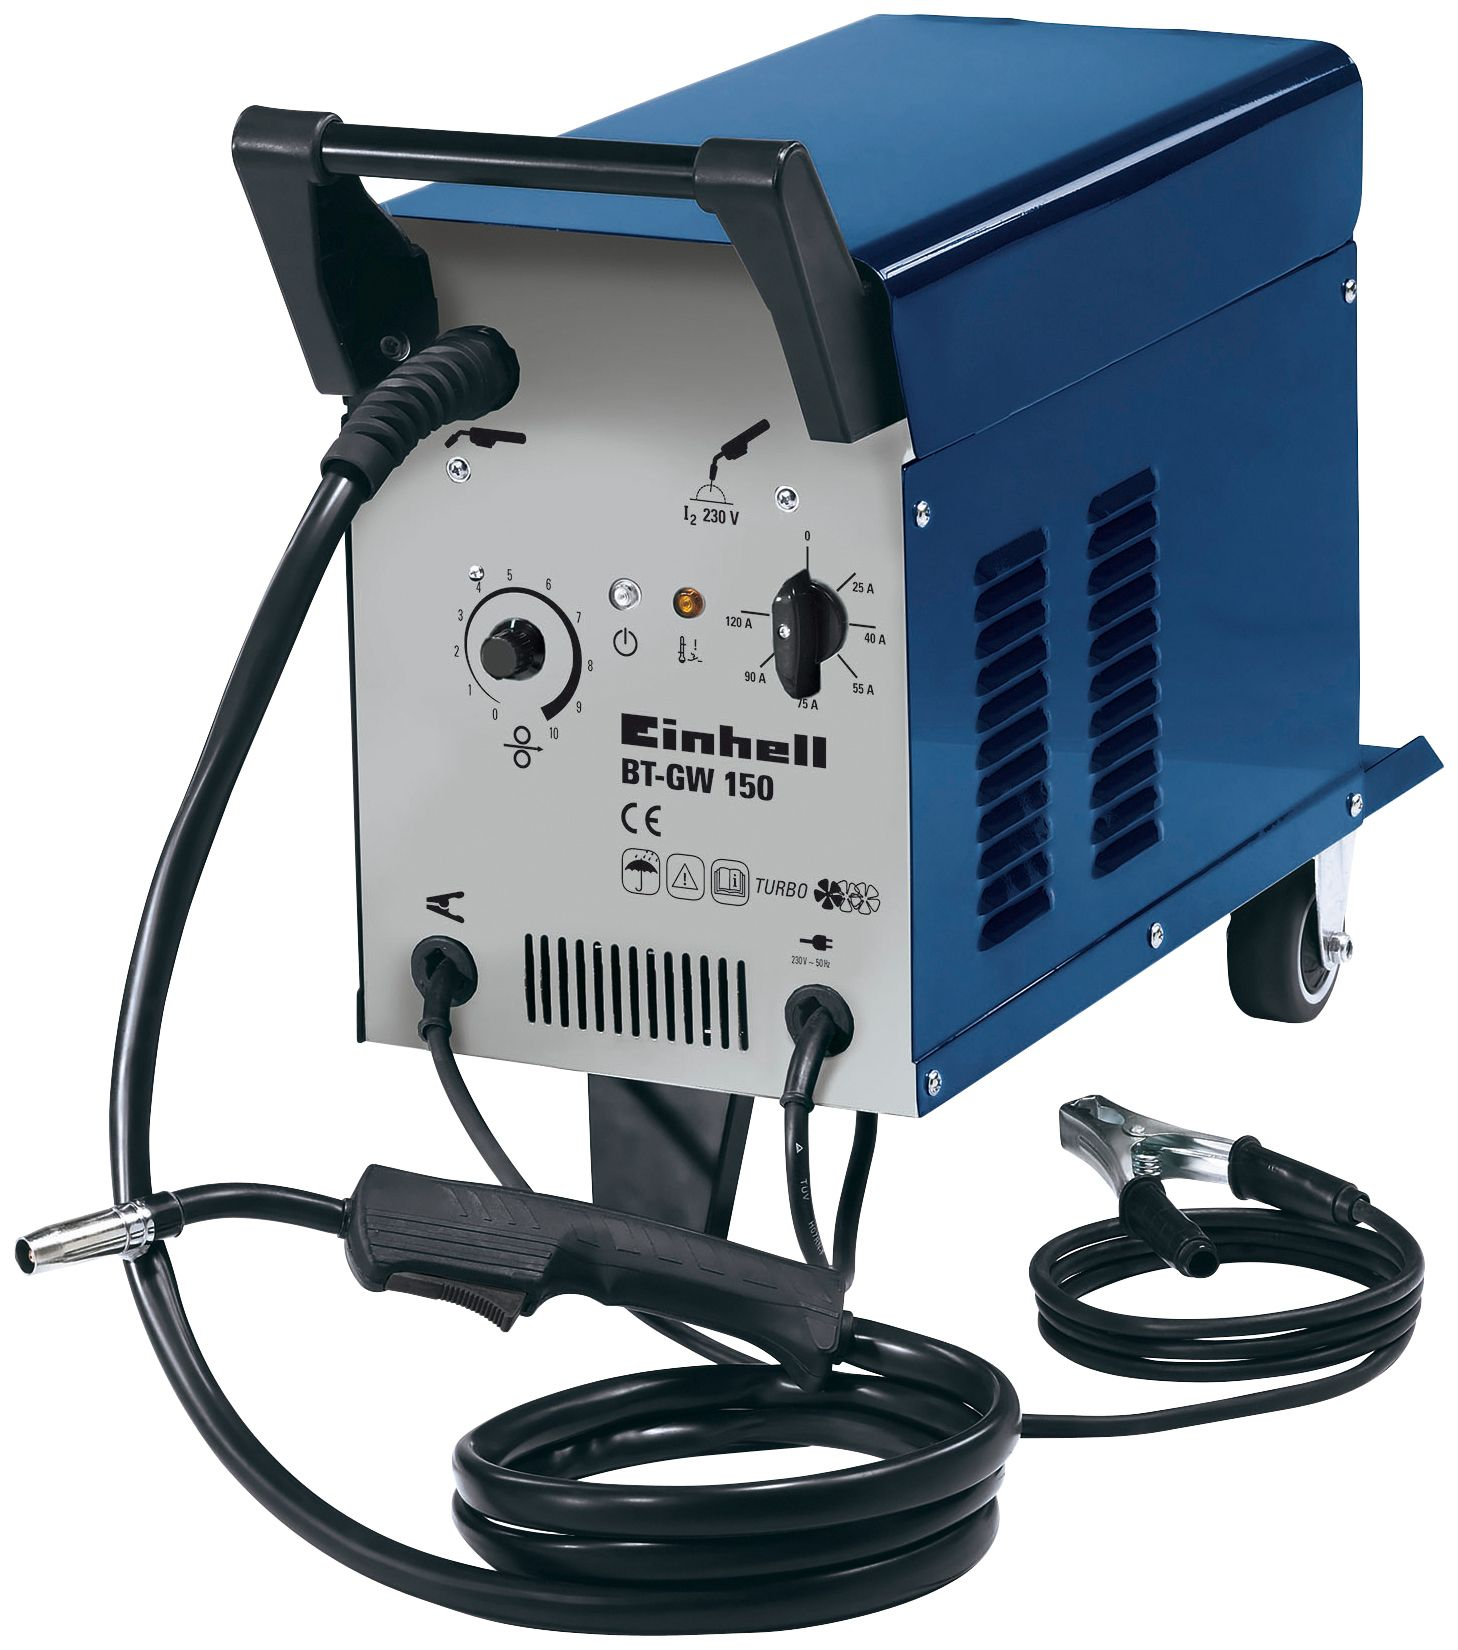 EINHELL Einhell BT-GW 150 Schutzgas-Schweissgerät